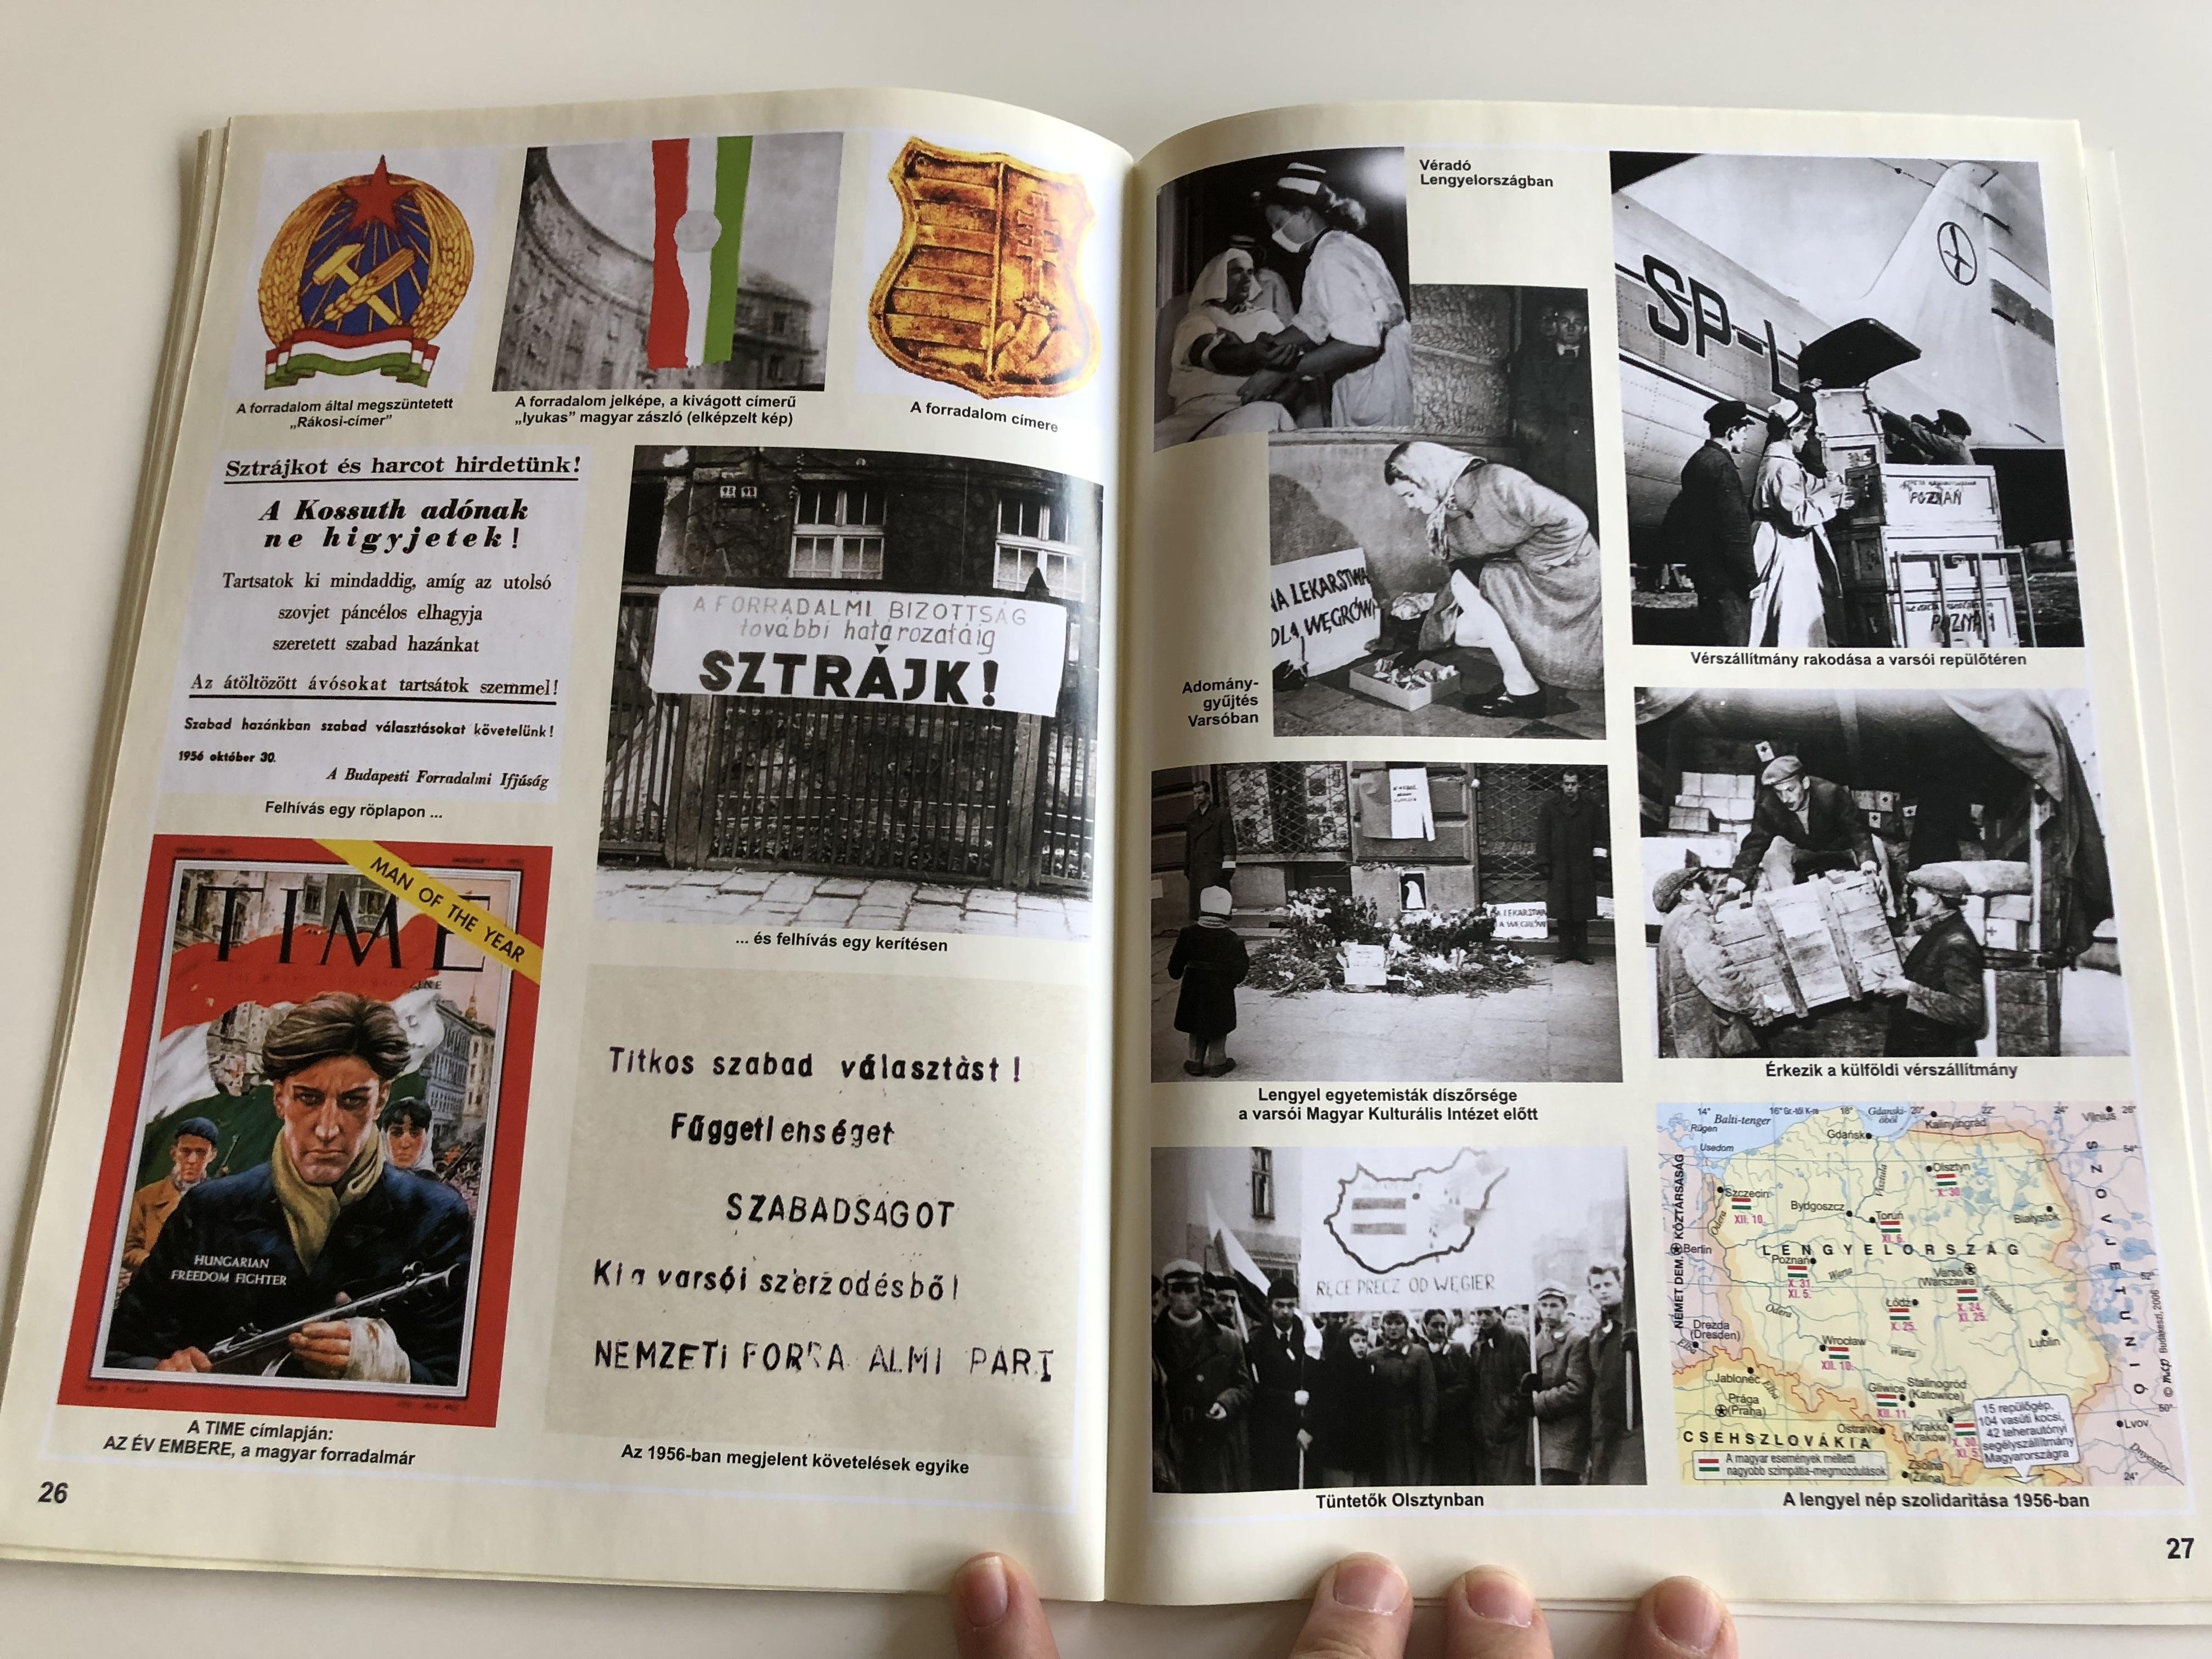 1956-esem-nyei-56-t-rk-peken-s-k-peken-t-rt-nelmi-atlas-the-events-of-1956-on-maps-and-photos-historical-atlas-2006-9-.jpg